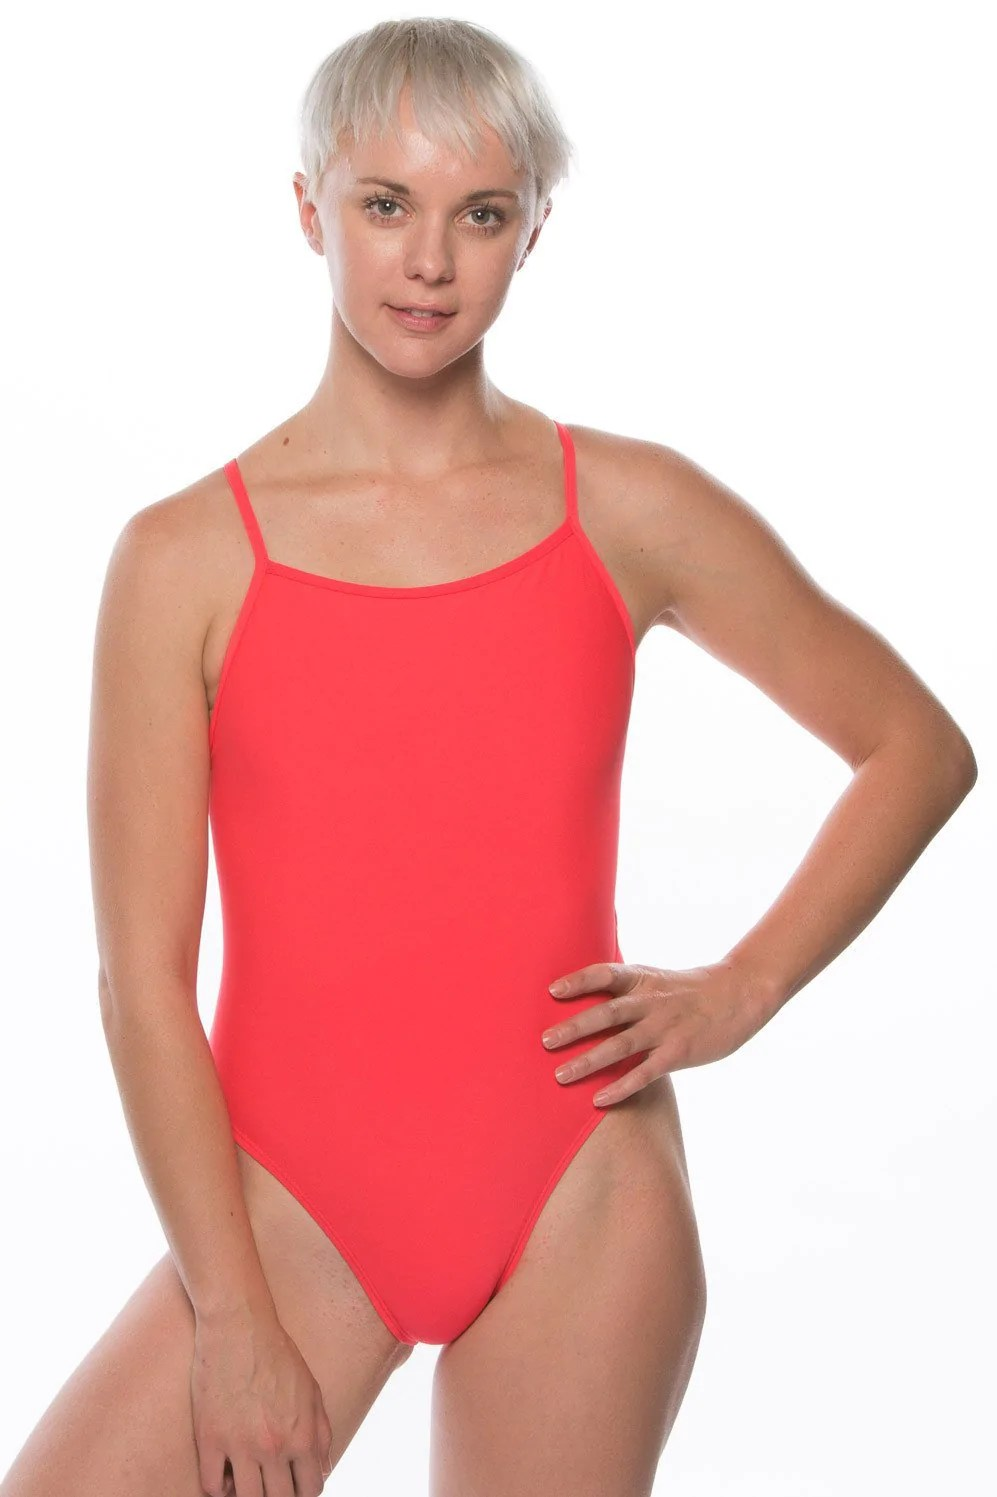 Mgctlbxn mzp mgctlbxv mgctlbxl  also brandon one piece swimsuit brights  jolyn rh jolynclothing